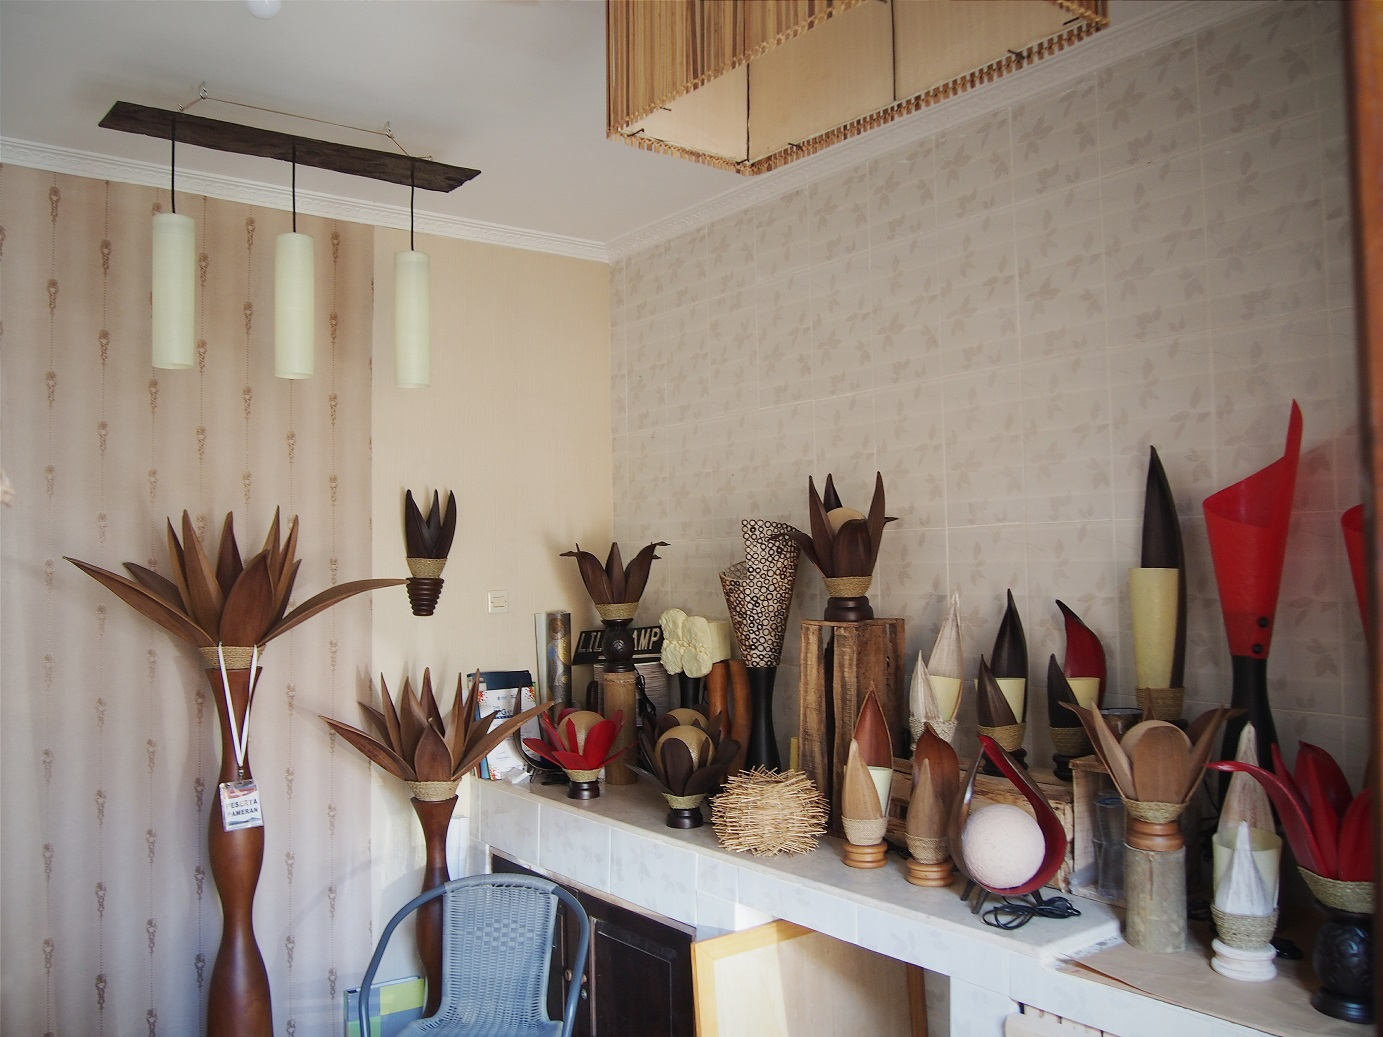 Produk-produk buatan Lily Lamp Art sepenuhnya hasil buatan tangan (Foto: Qlapa.com)